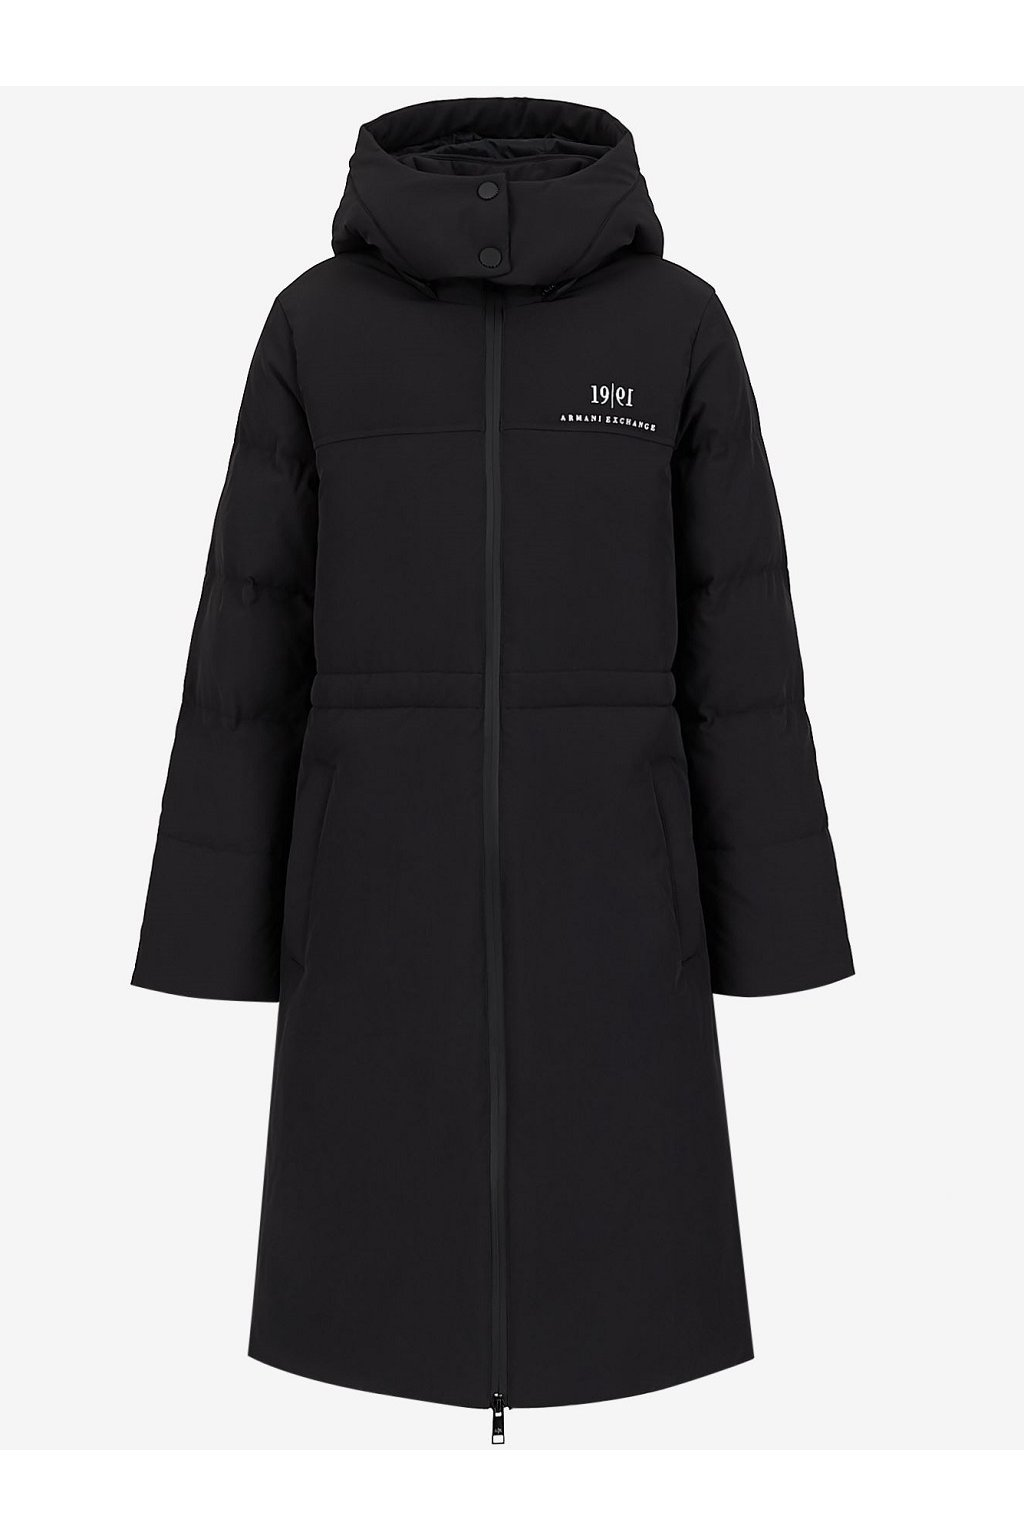 Dámský kabát Armani Exchange 6KYK11 YNTUZ černý